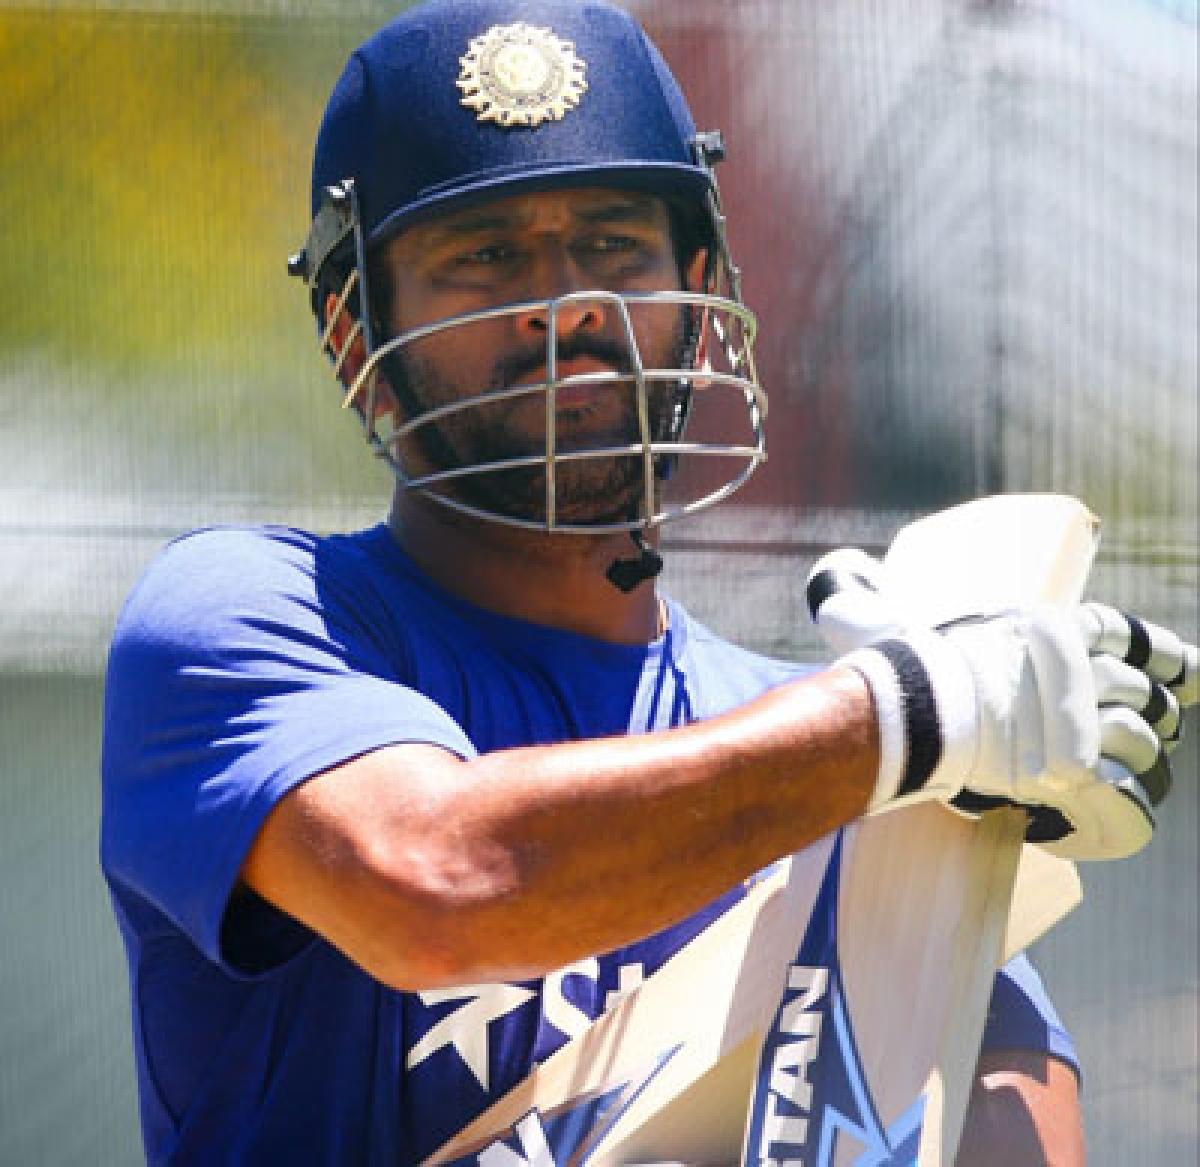 Sakshi Singh Dhoni shares Mahendra Singh Dhoni's addition